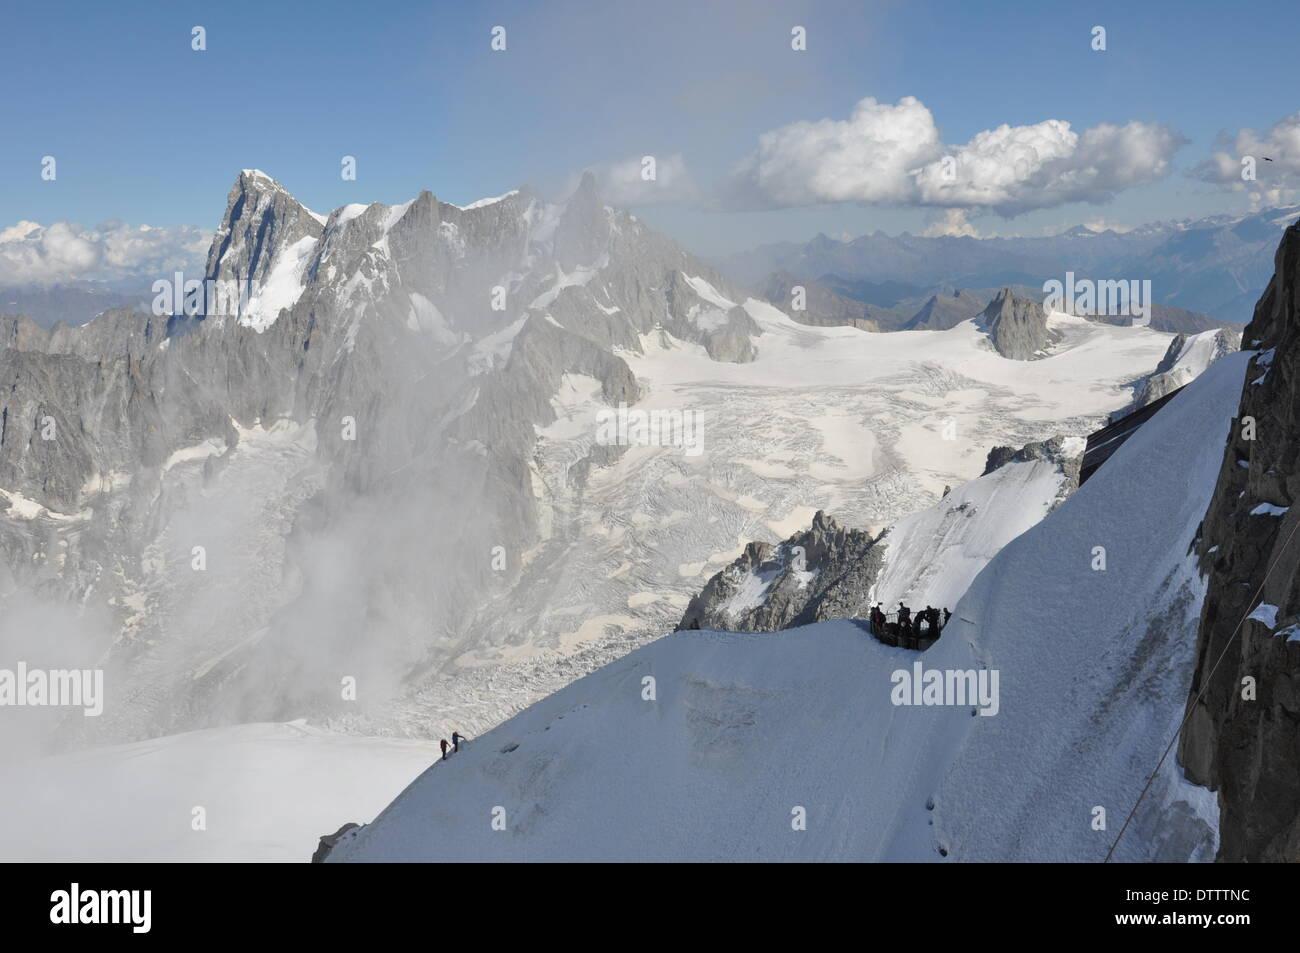 Mont-Blanc-Massiv,France - Stock Image